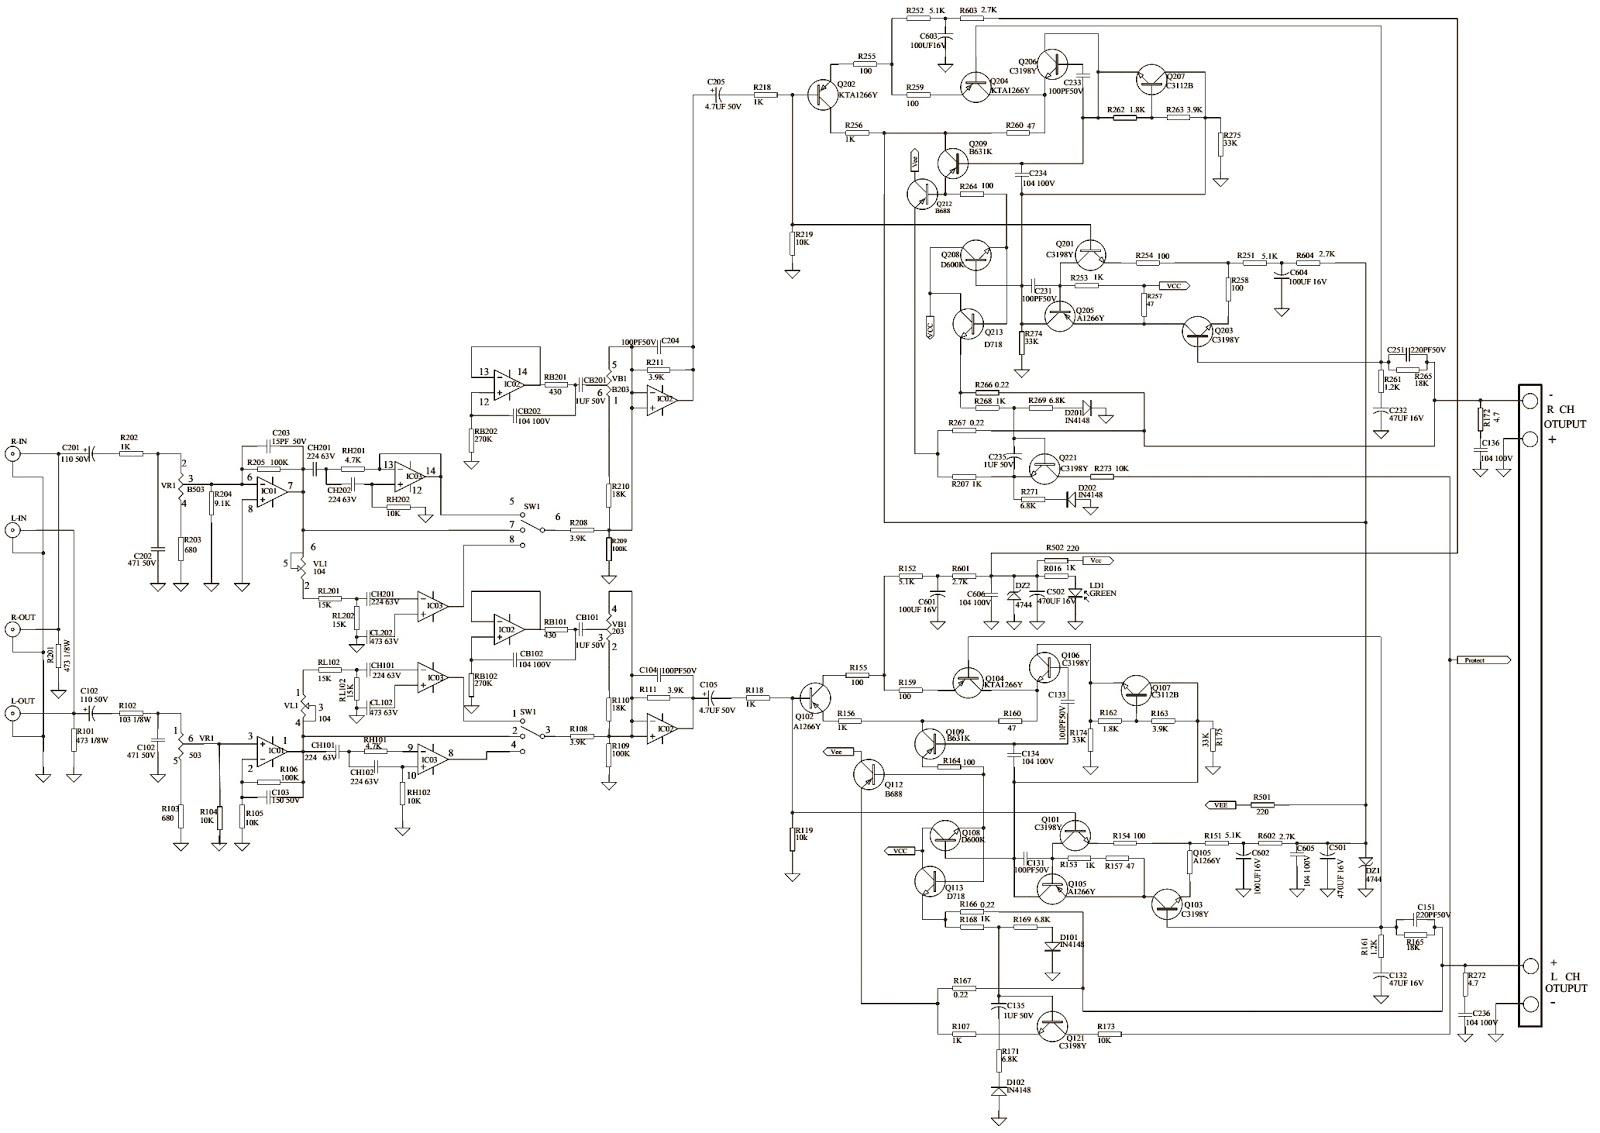 Prology Control Car Audio Schematic